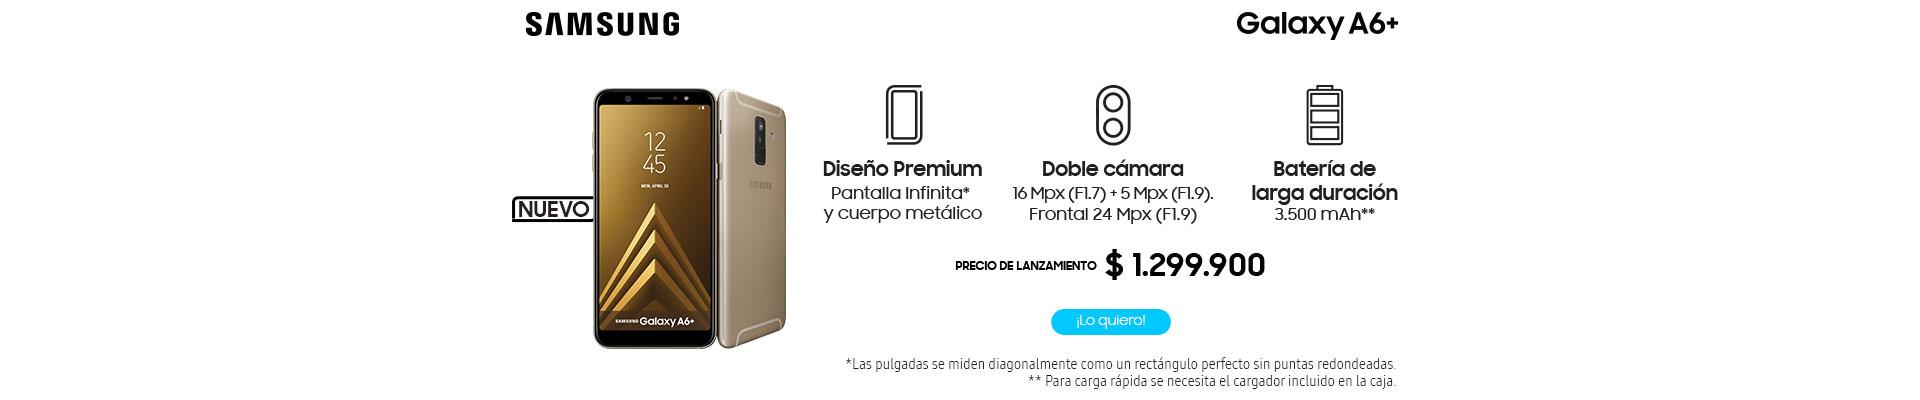 AK-PPAL-2-celulares-LNZ---Samsung-A6Plus-Jul13